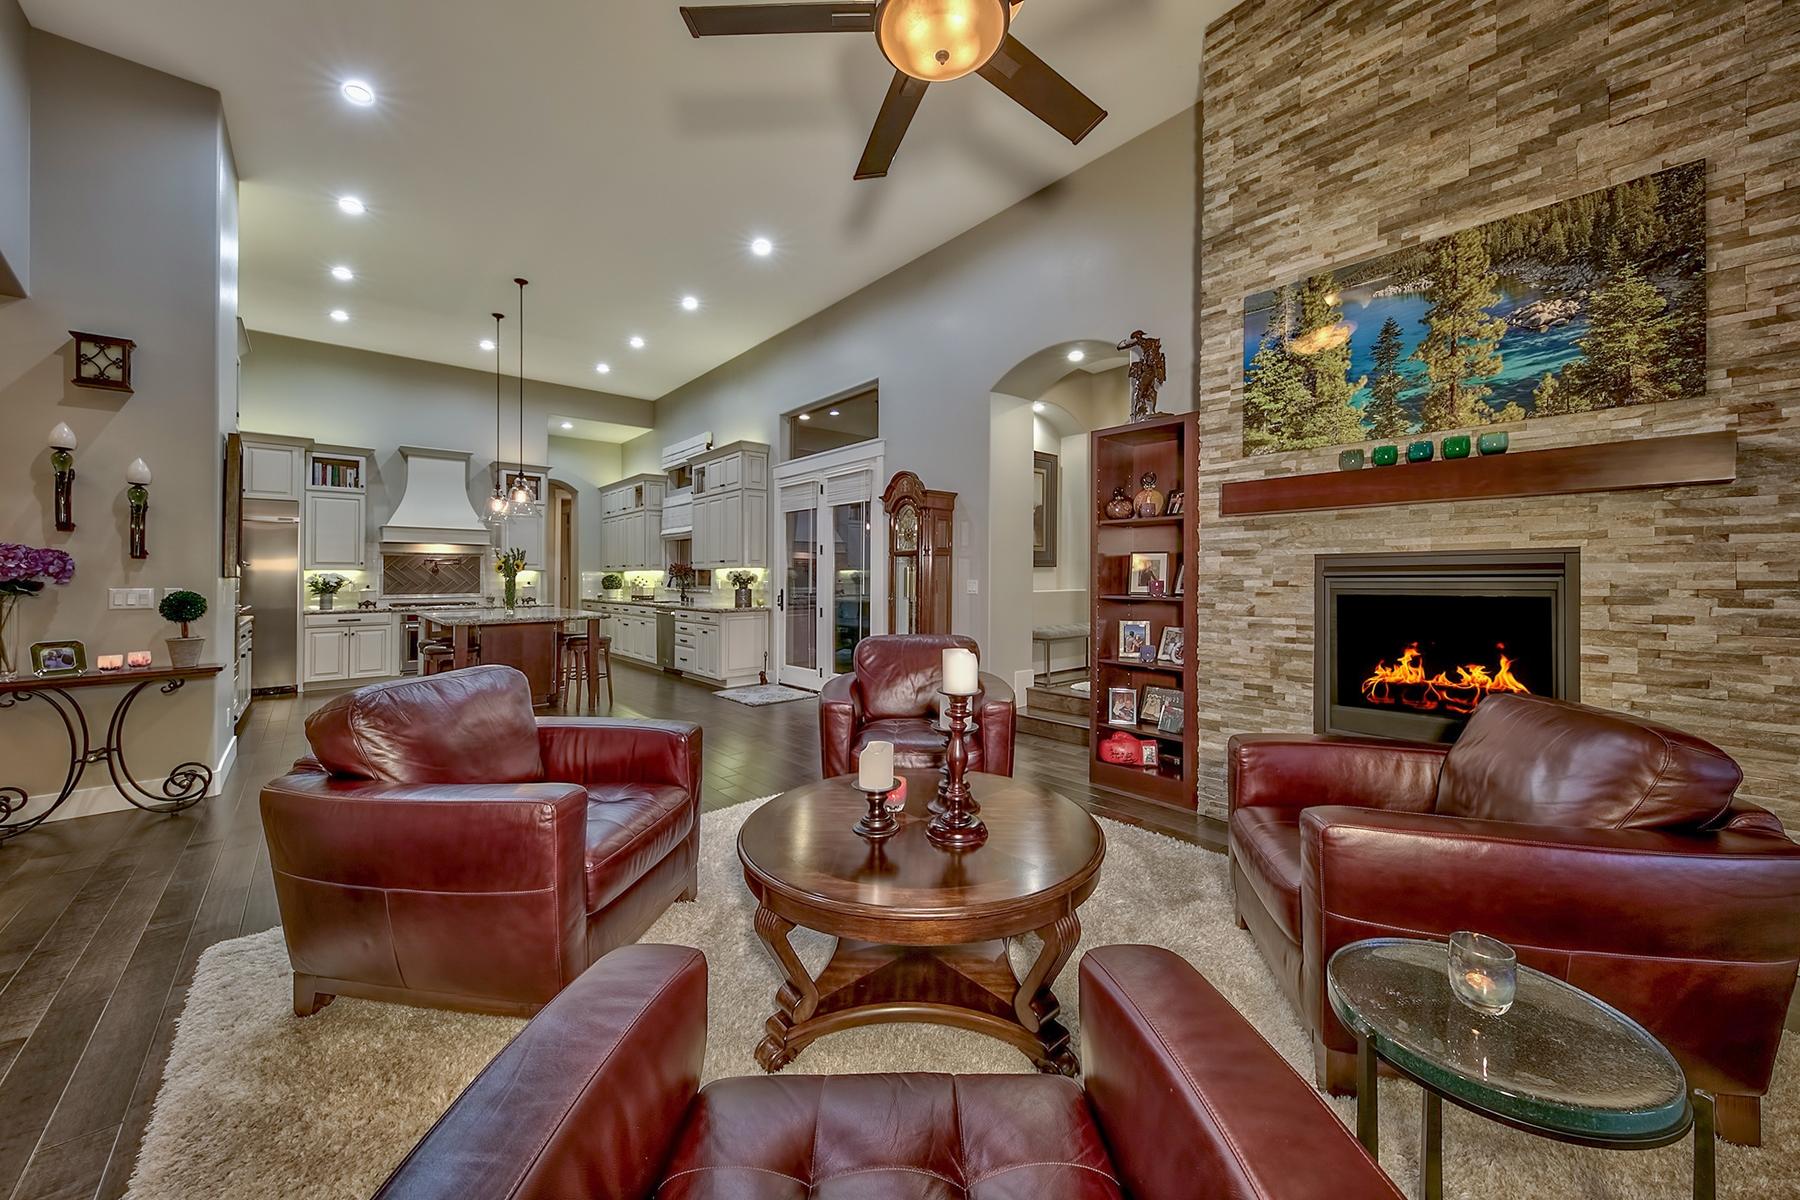 Additional photo for property listing at 1183 Eagle Vista Court, Reno, Nevada 89511 1183 Eagle Vista Ct. Reno, Nevada 89511 United States